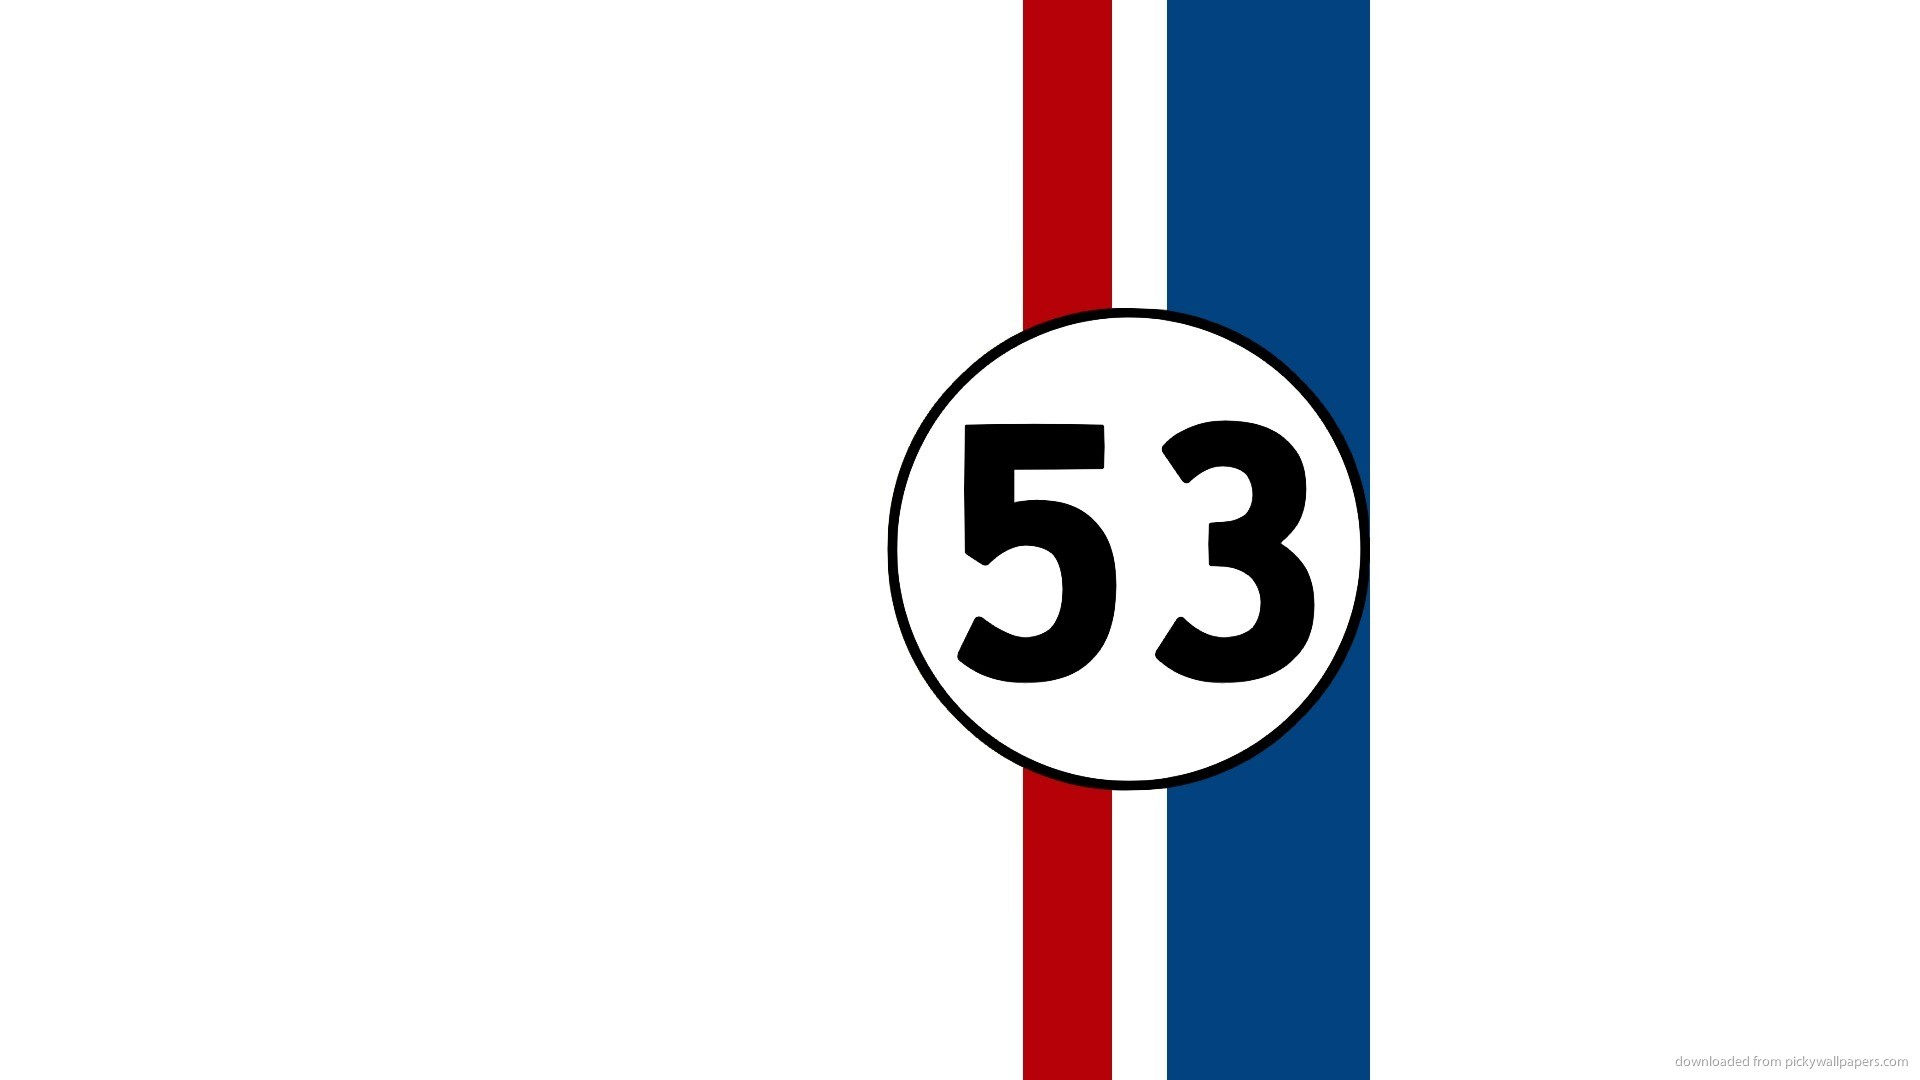 HD Herbie 53 wallpaper